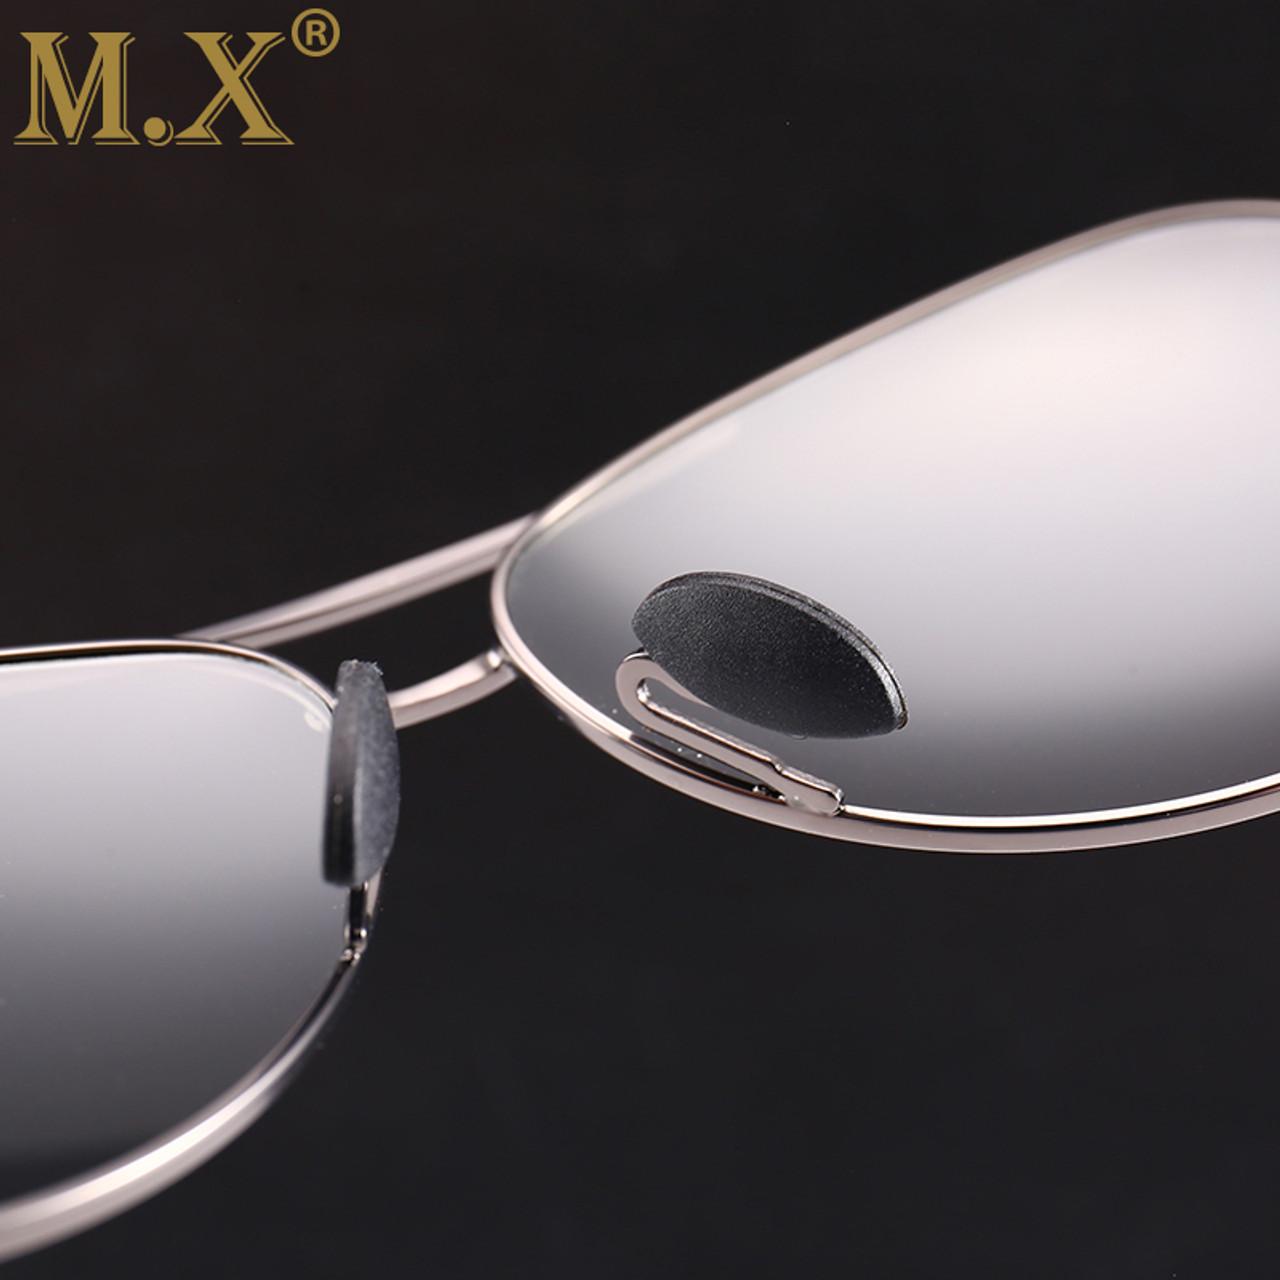 d9cf34f4a33 ... 2018 Pilot Photochromic Sunglasses Men Driving Polarized Sun Glasses  Chameleon Driver Safety Night Vision Goggles Glasses ...